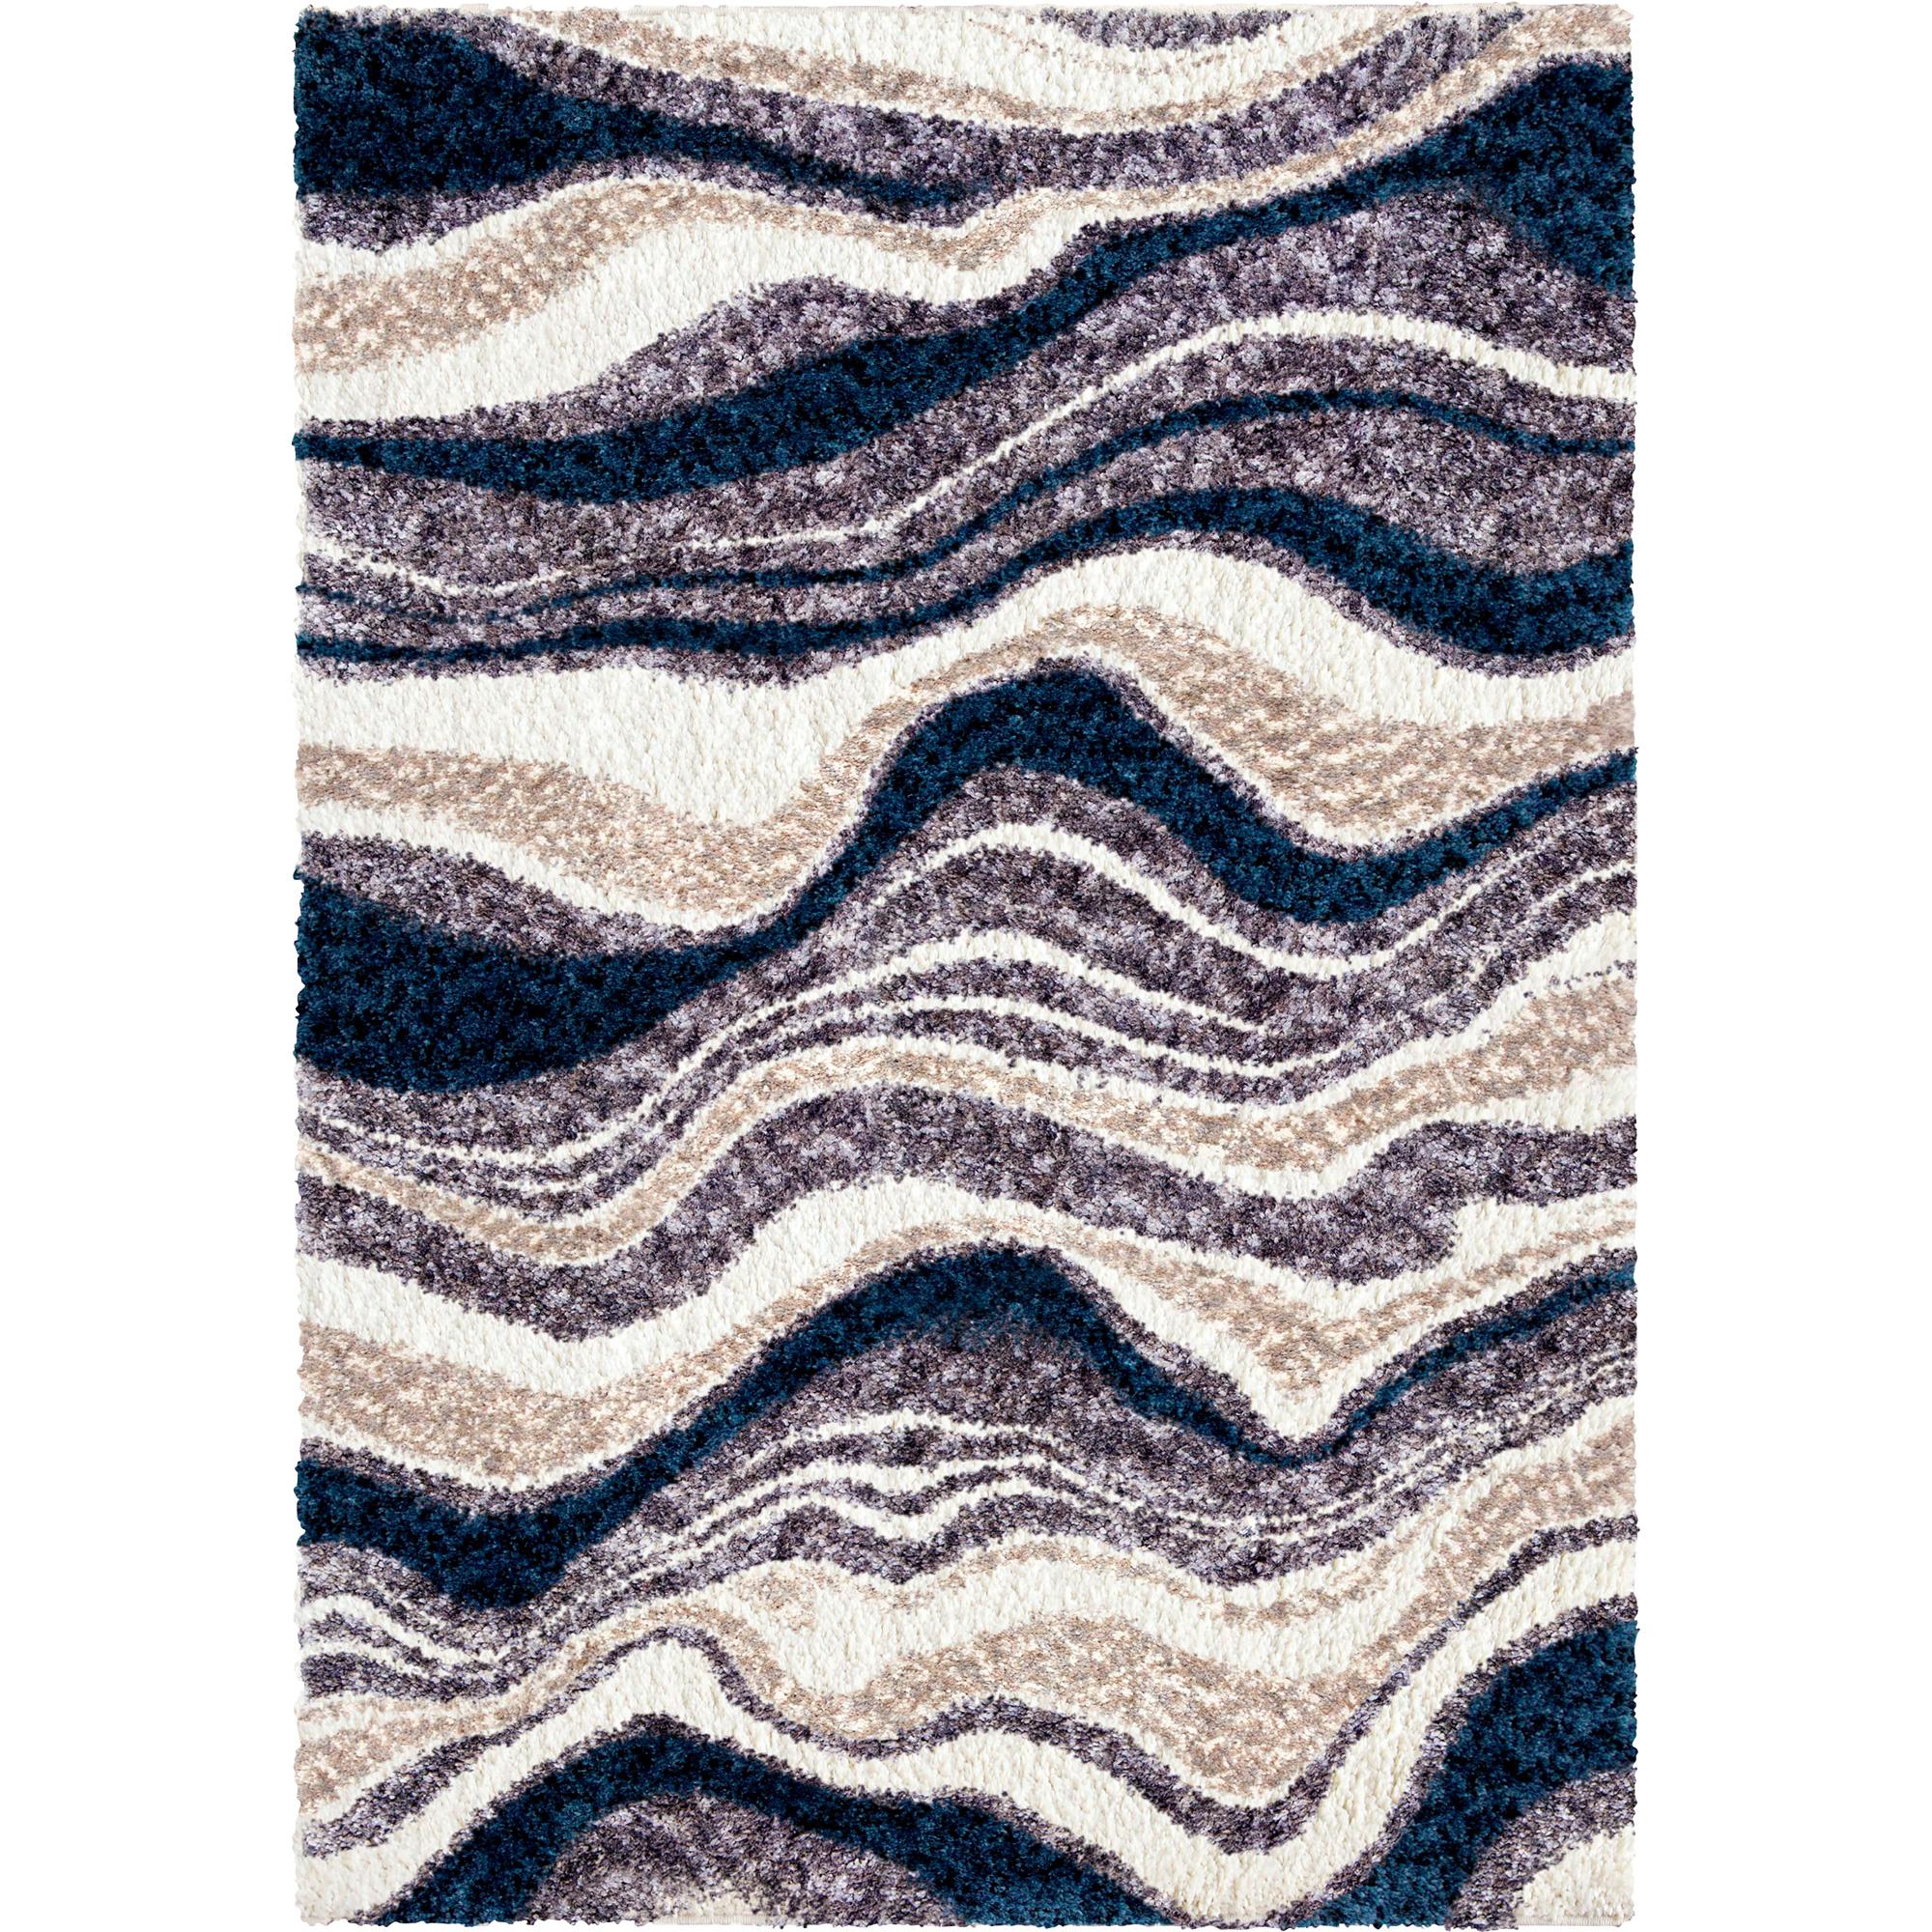 Orian | Cotton Tail Agate Denim 8x10 Area Rug